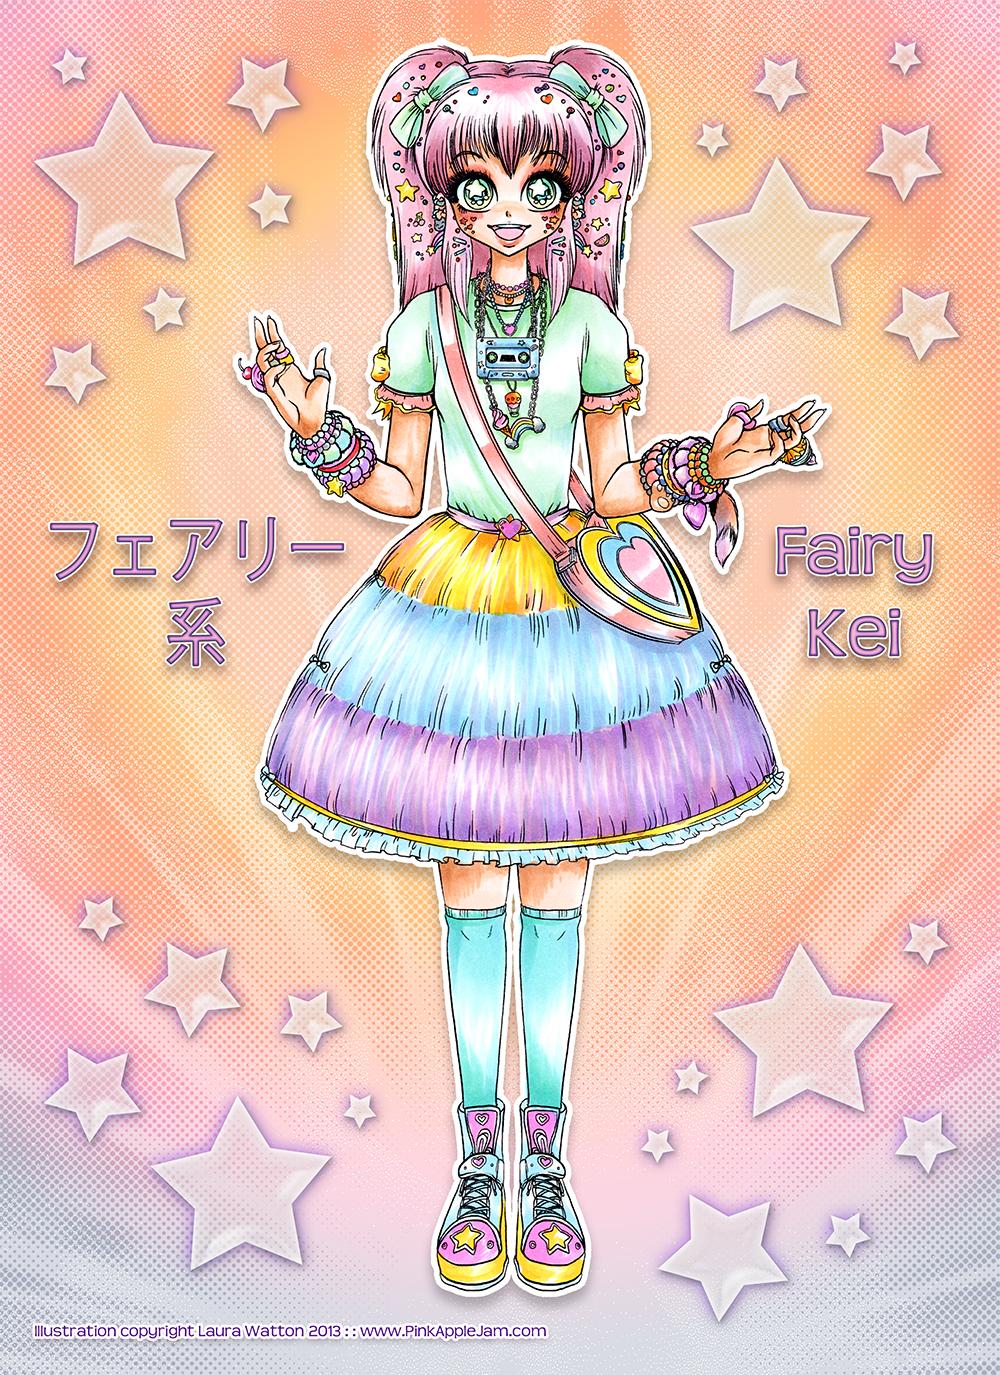 fairy_kei_poster_prev.jpg